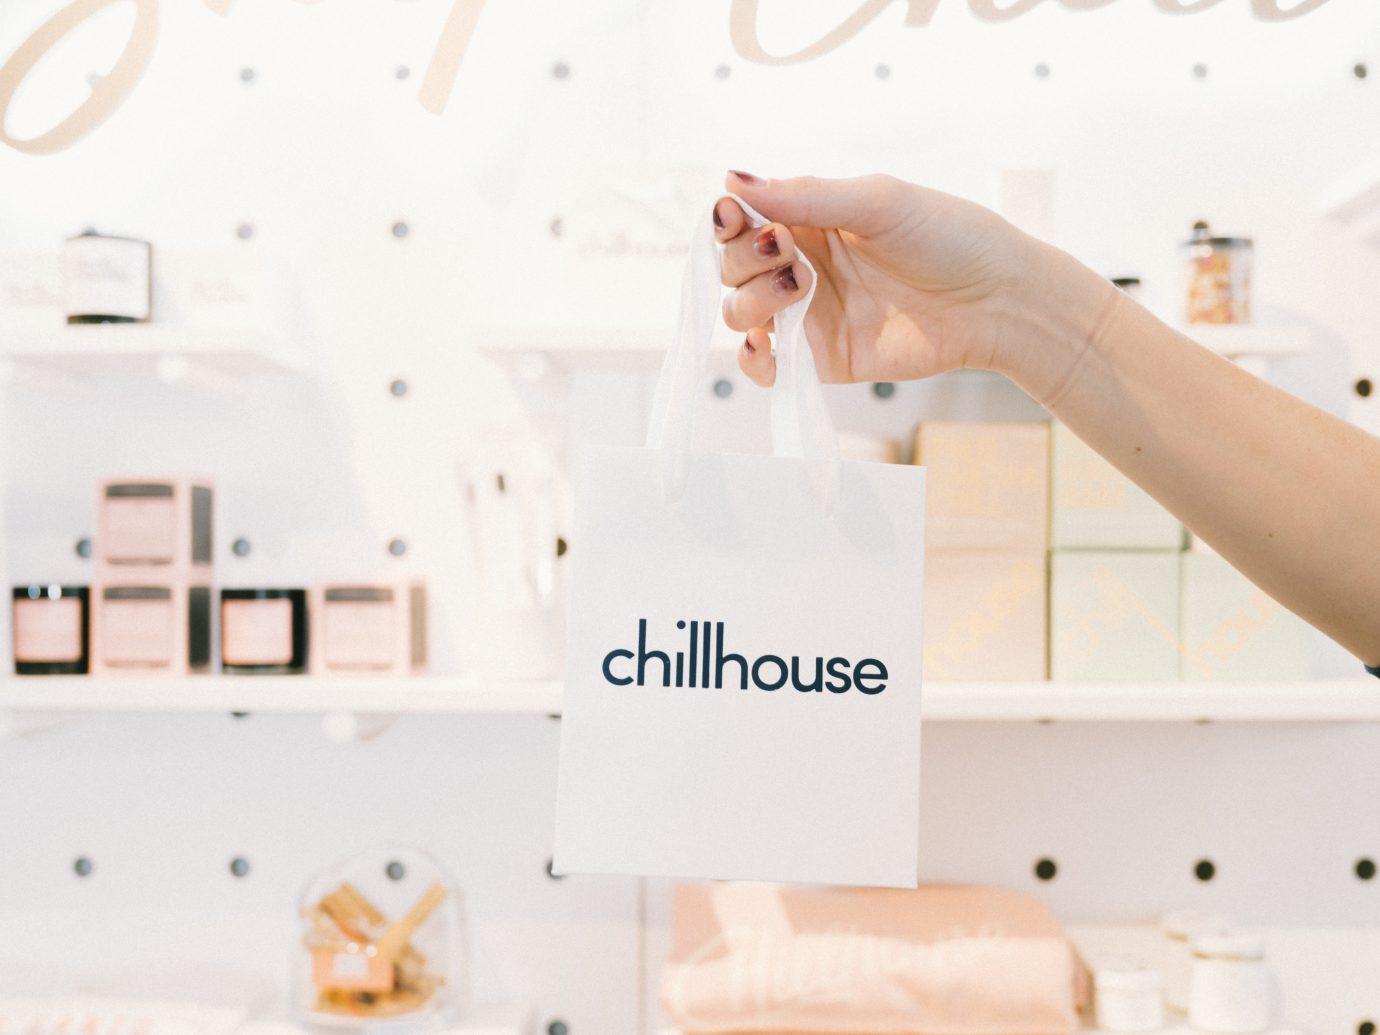 Chillhouse interior